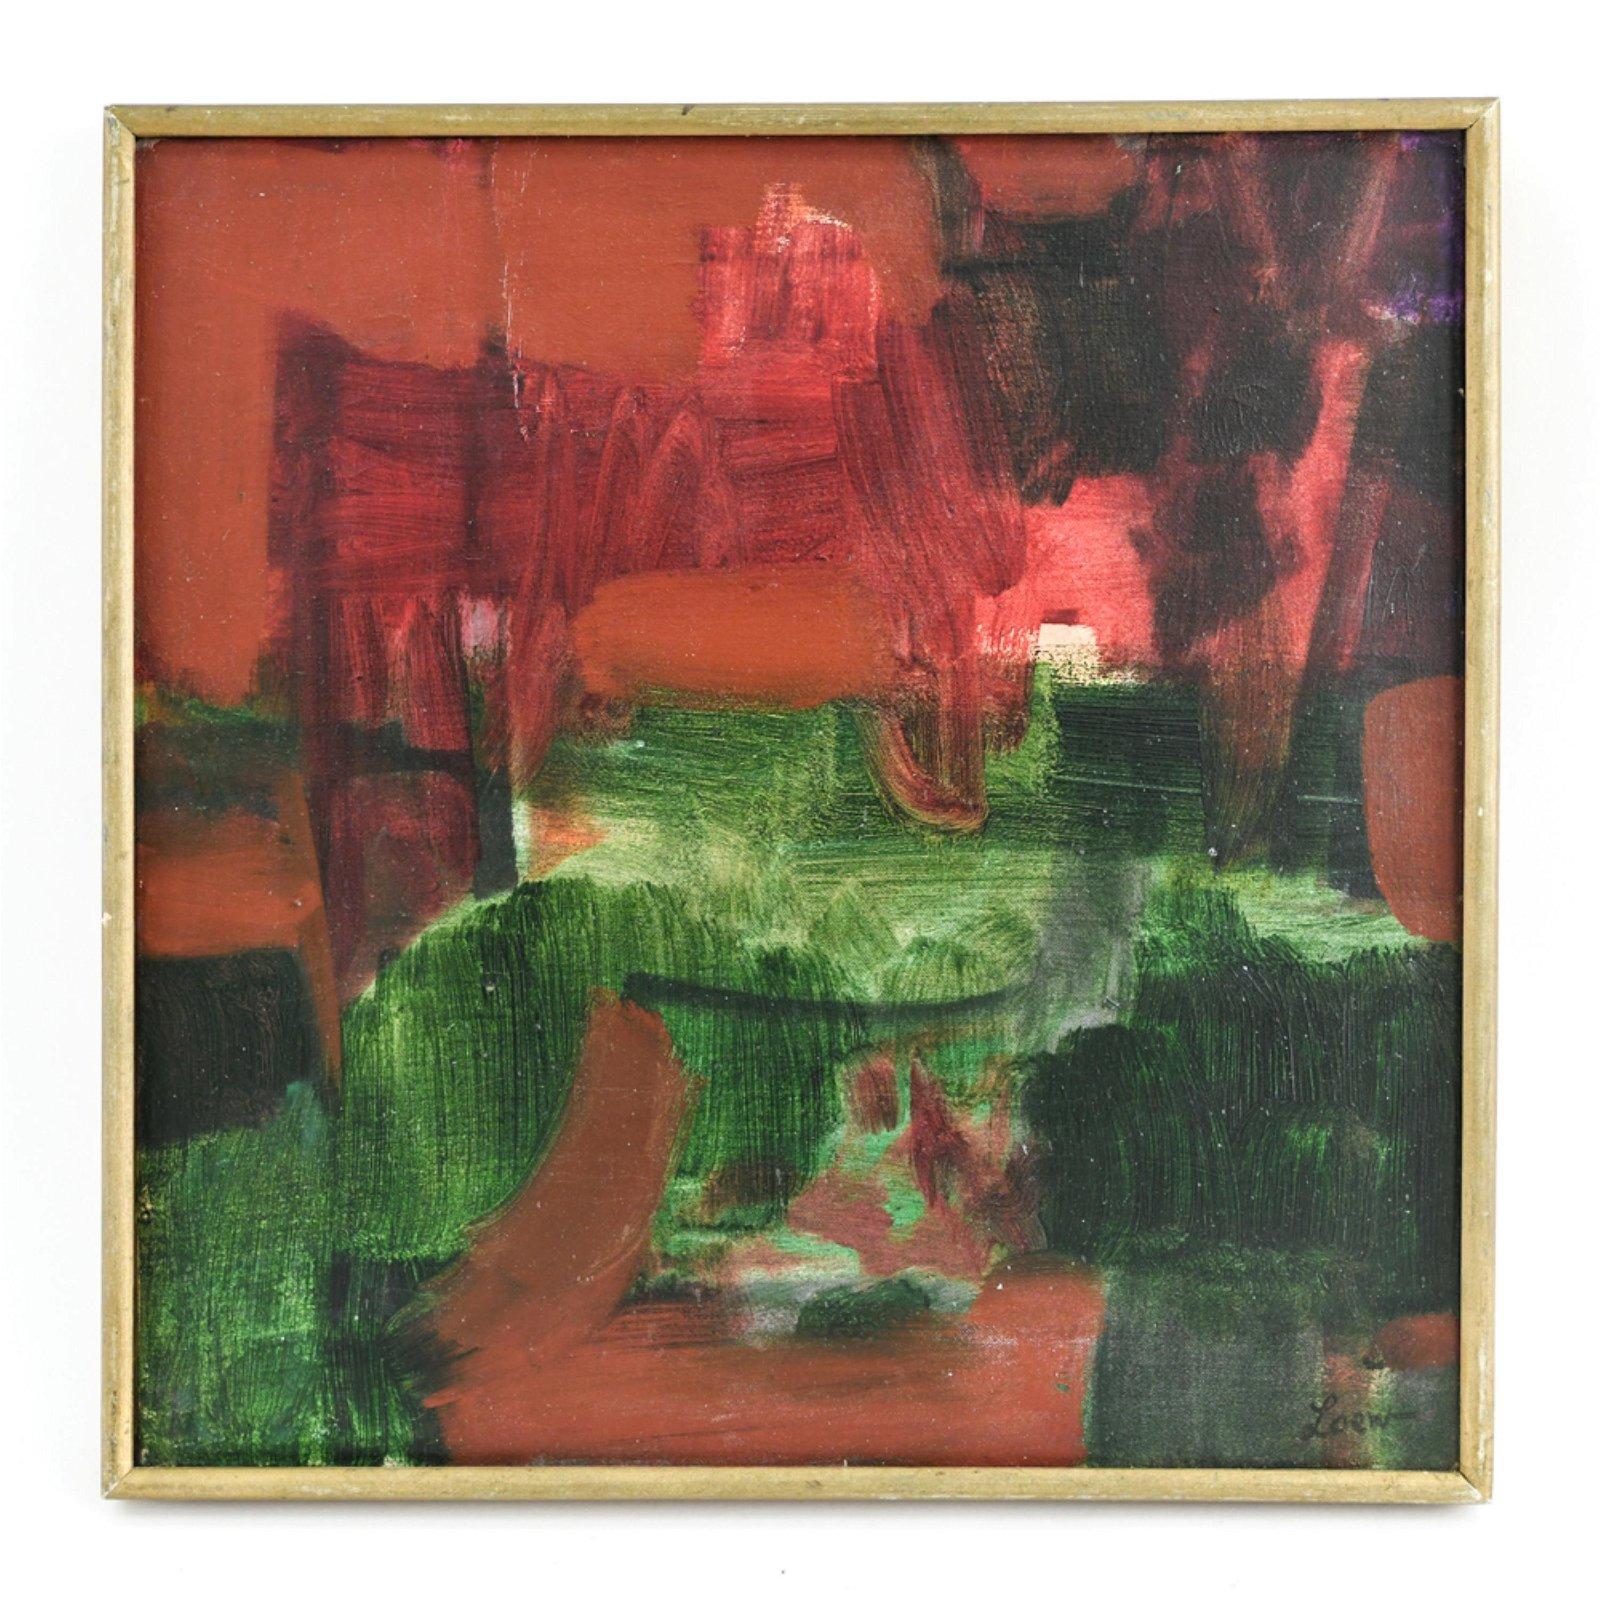 MICHAEL LOEW, AMERICAN (1907-1985) ABSTRACT O/C